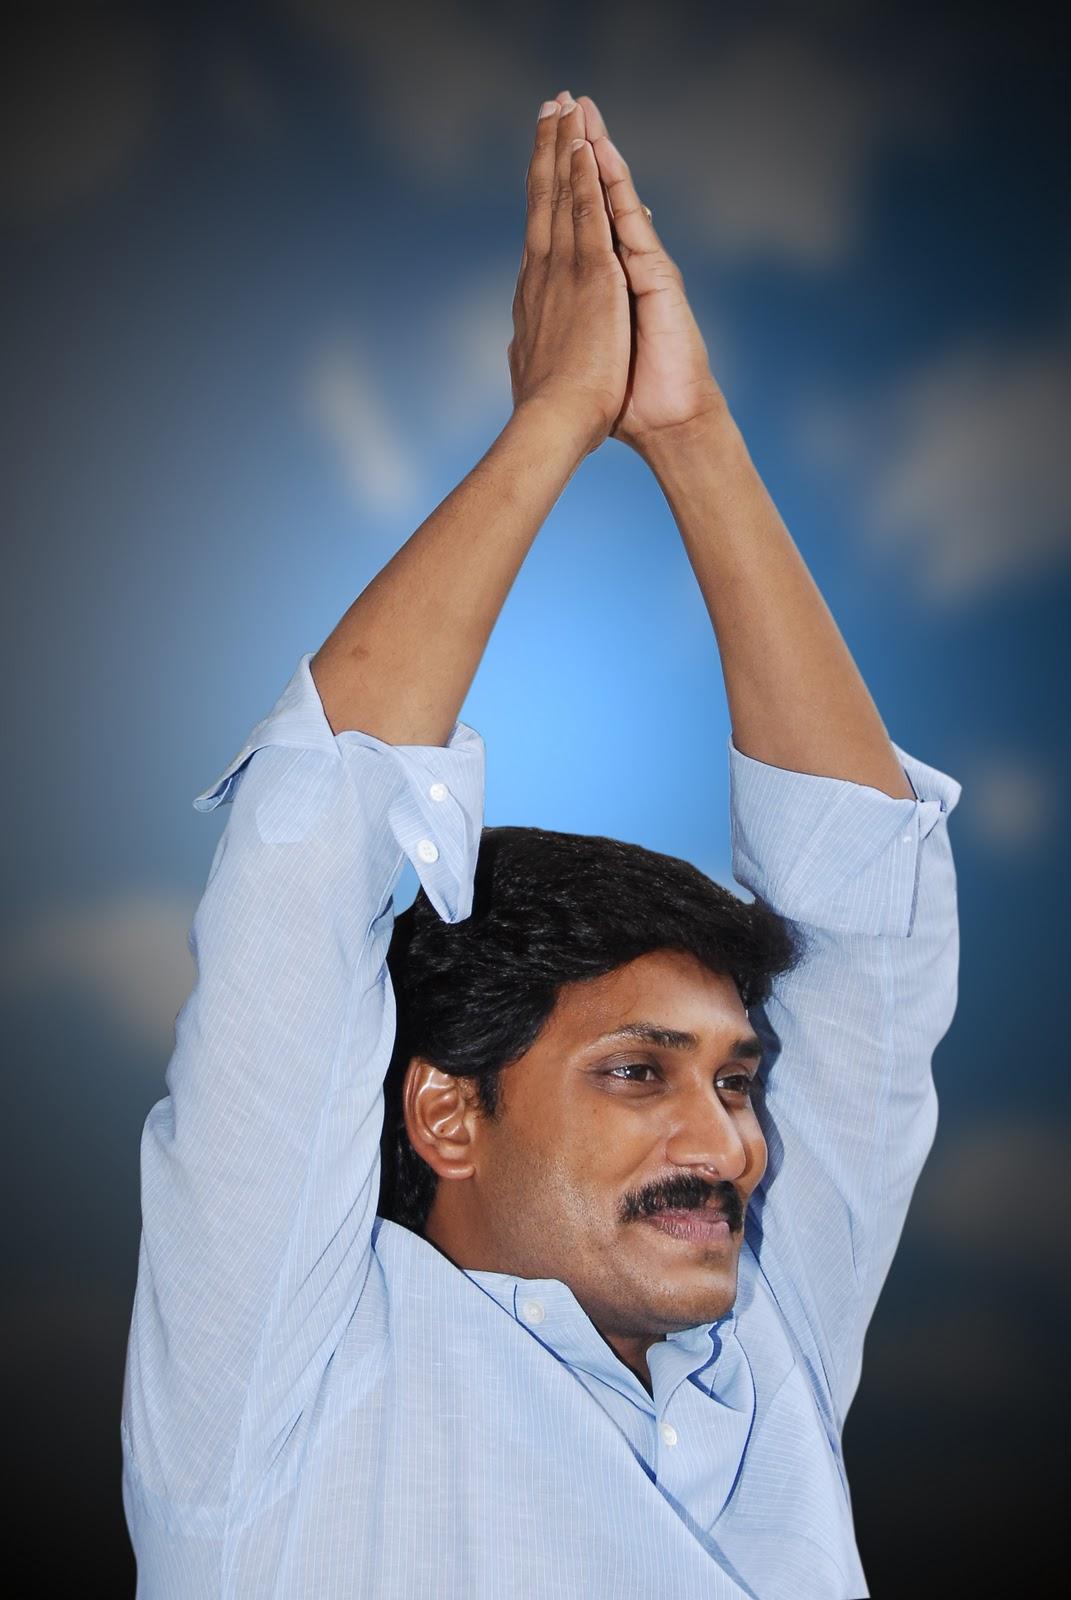 YSRCP SC CELL: Sri YS Jagan Mohan Reddy